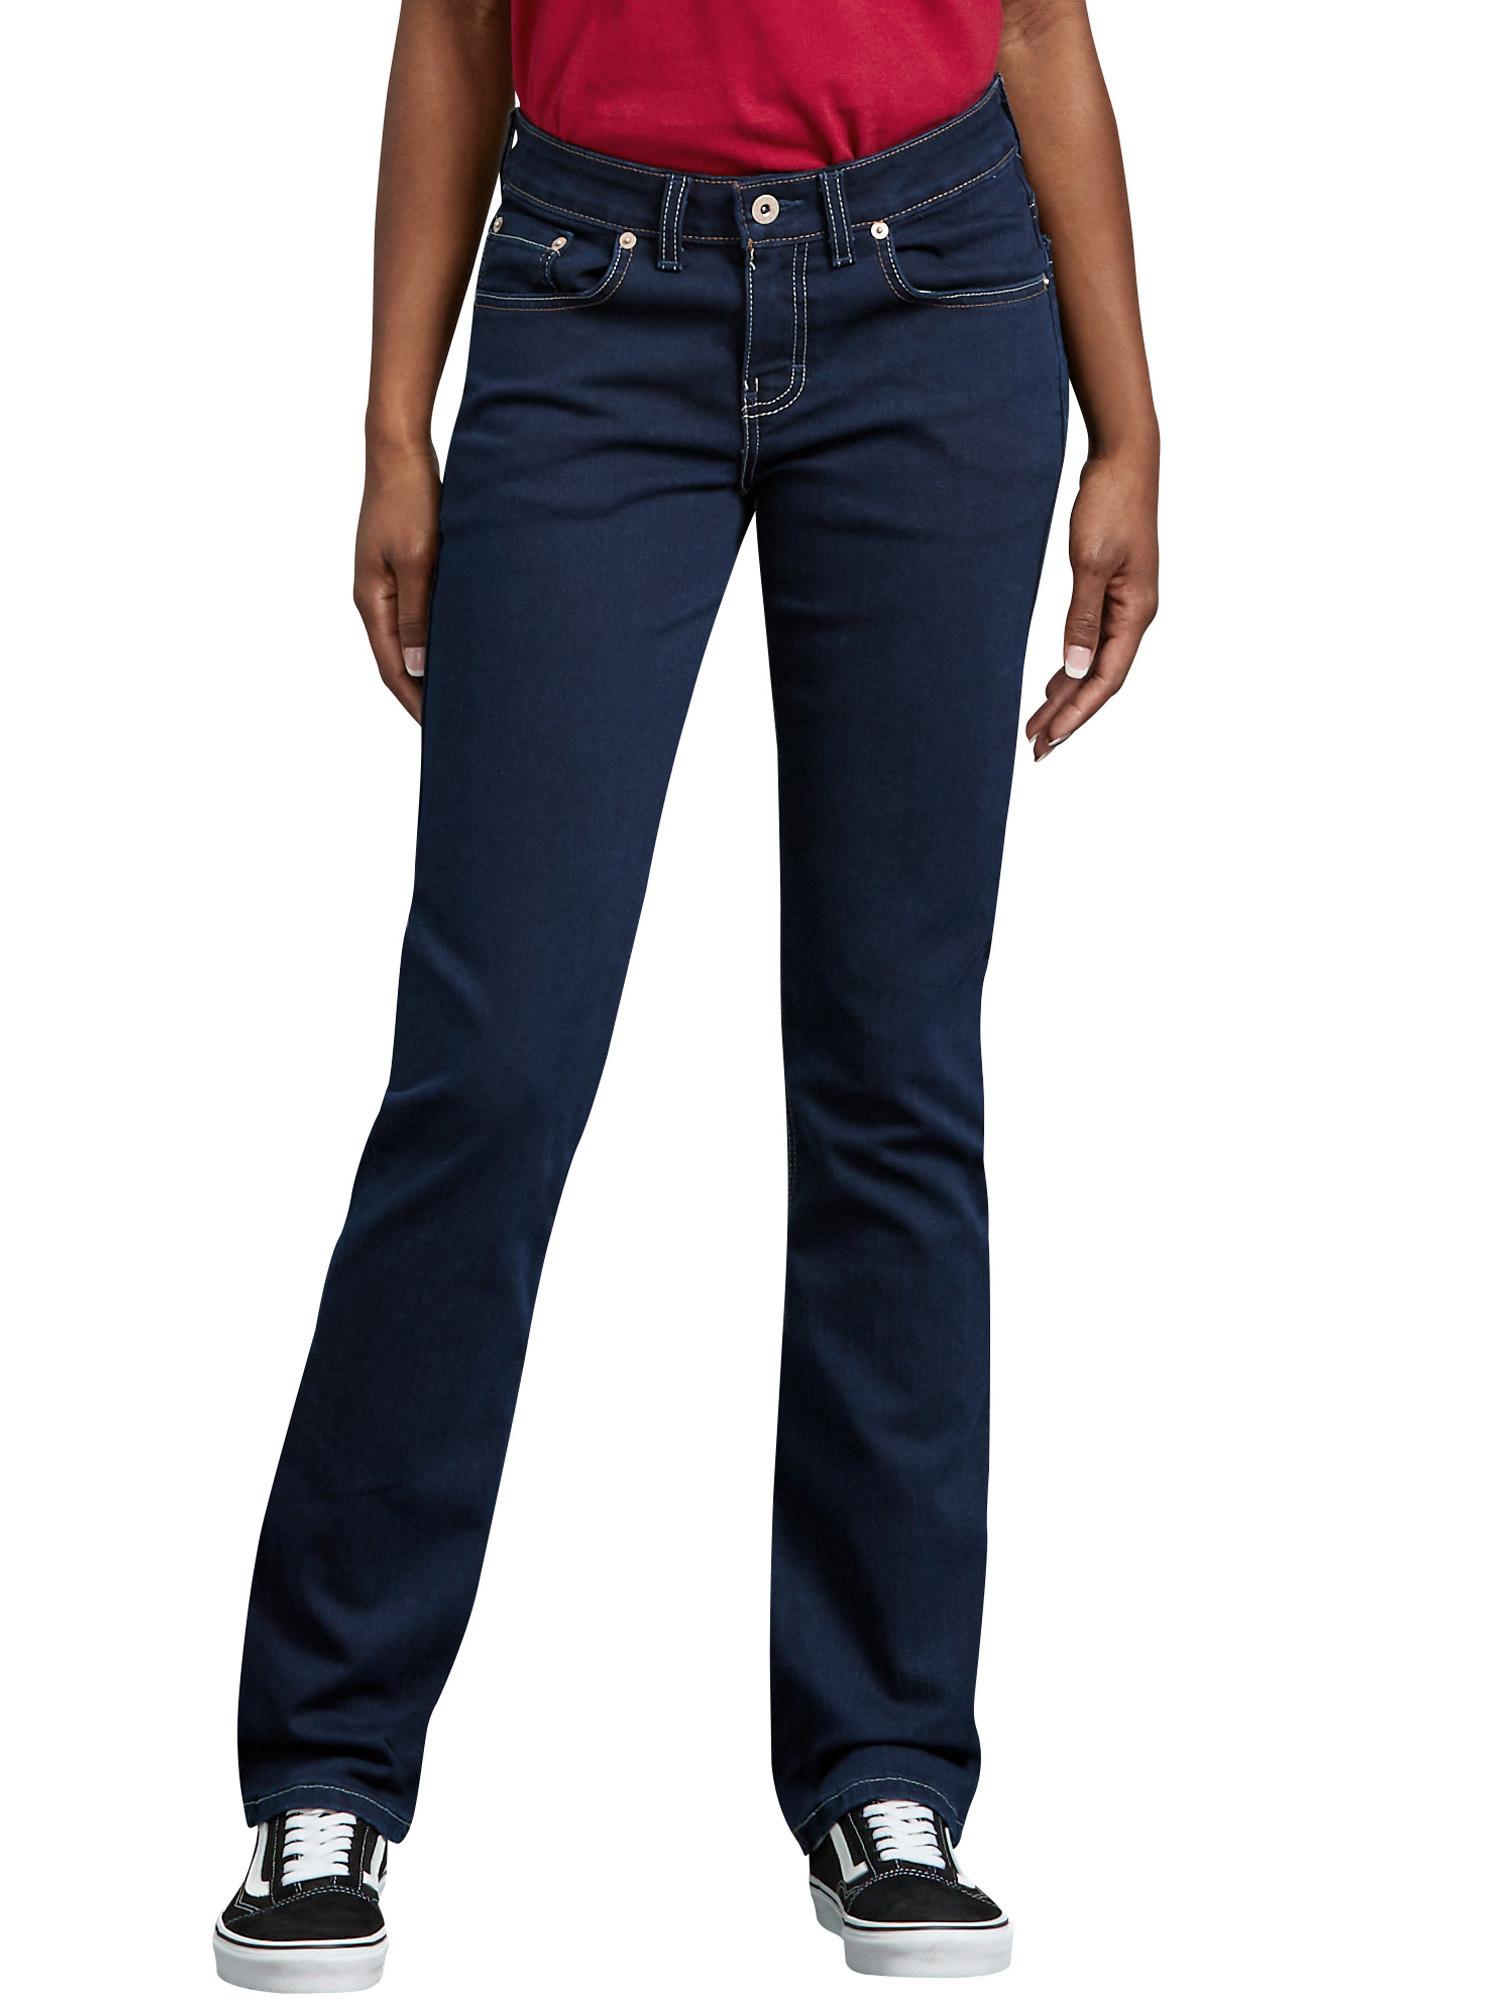 Women's Relaxed Straight Leg Jean